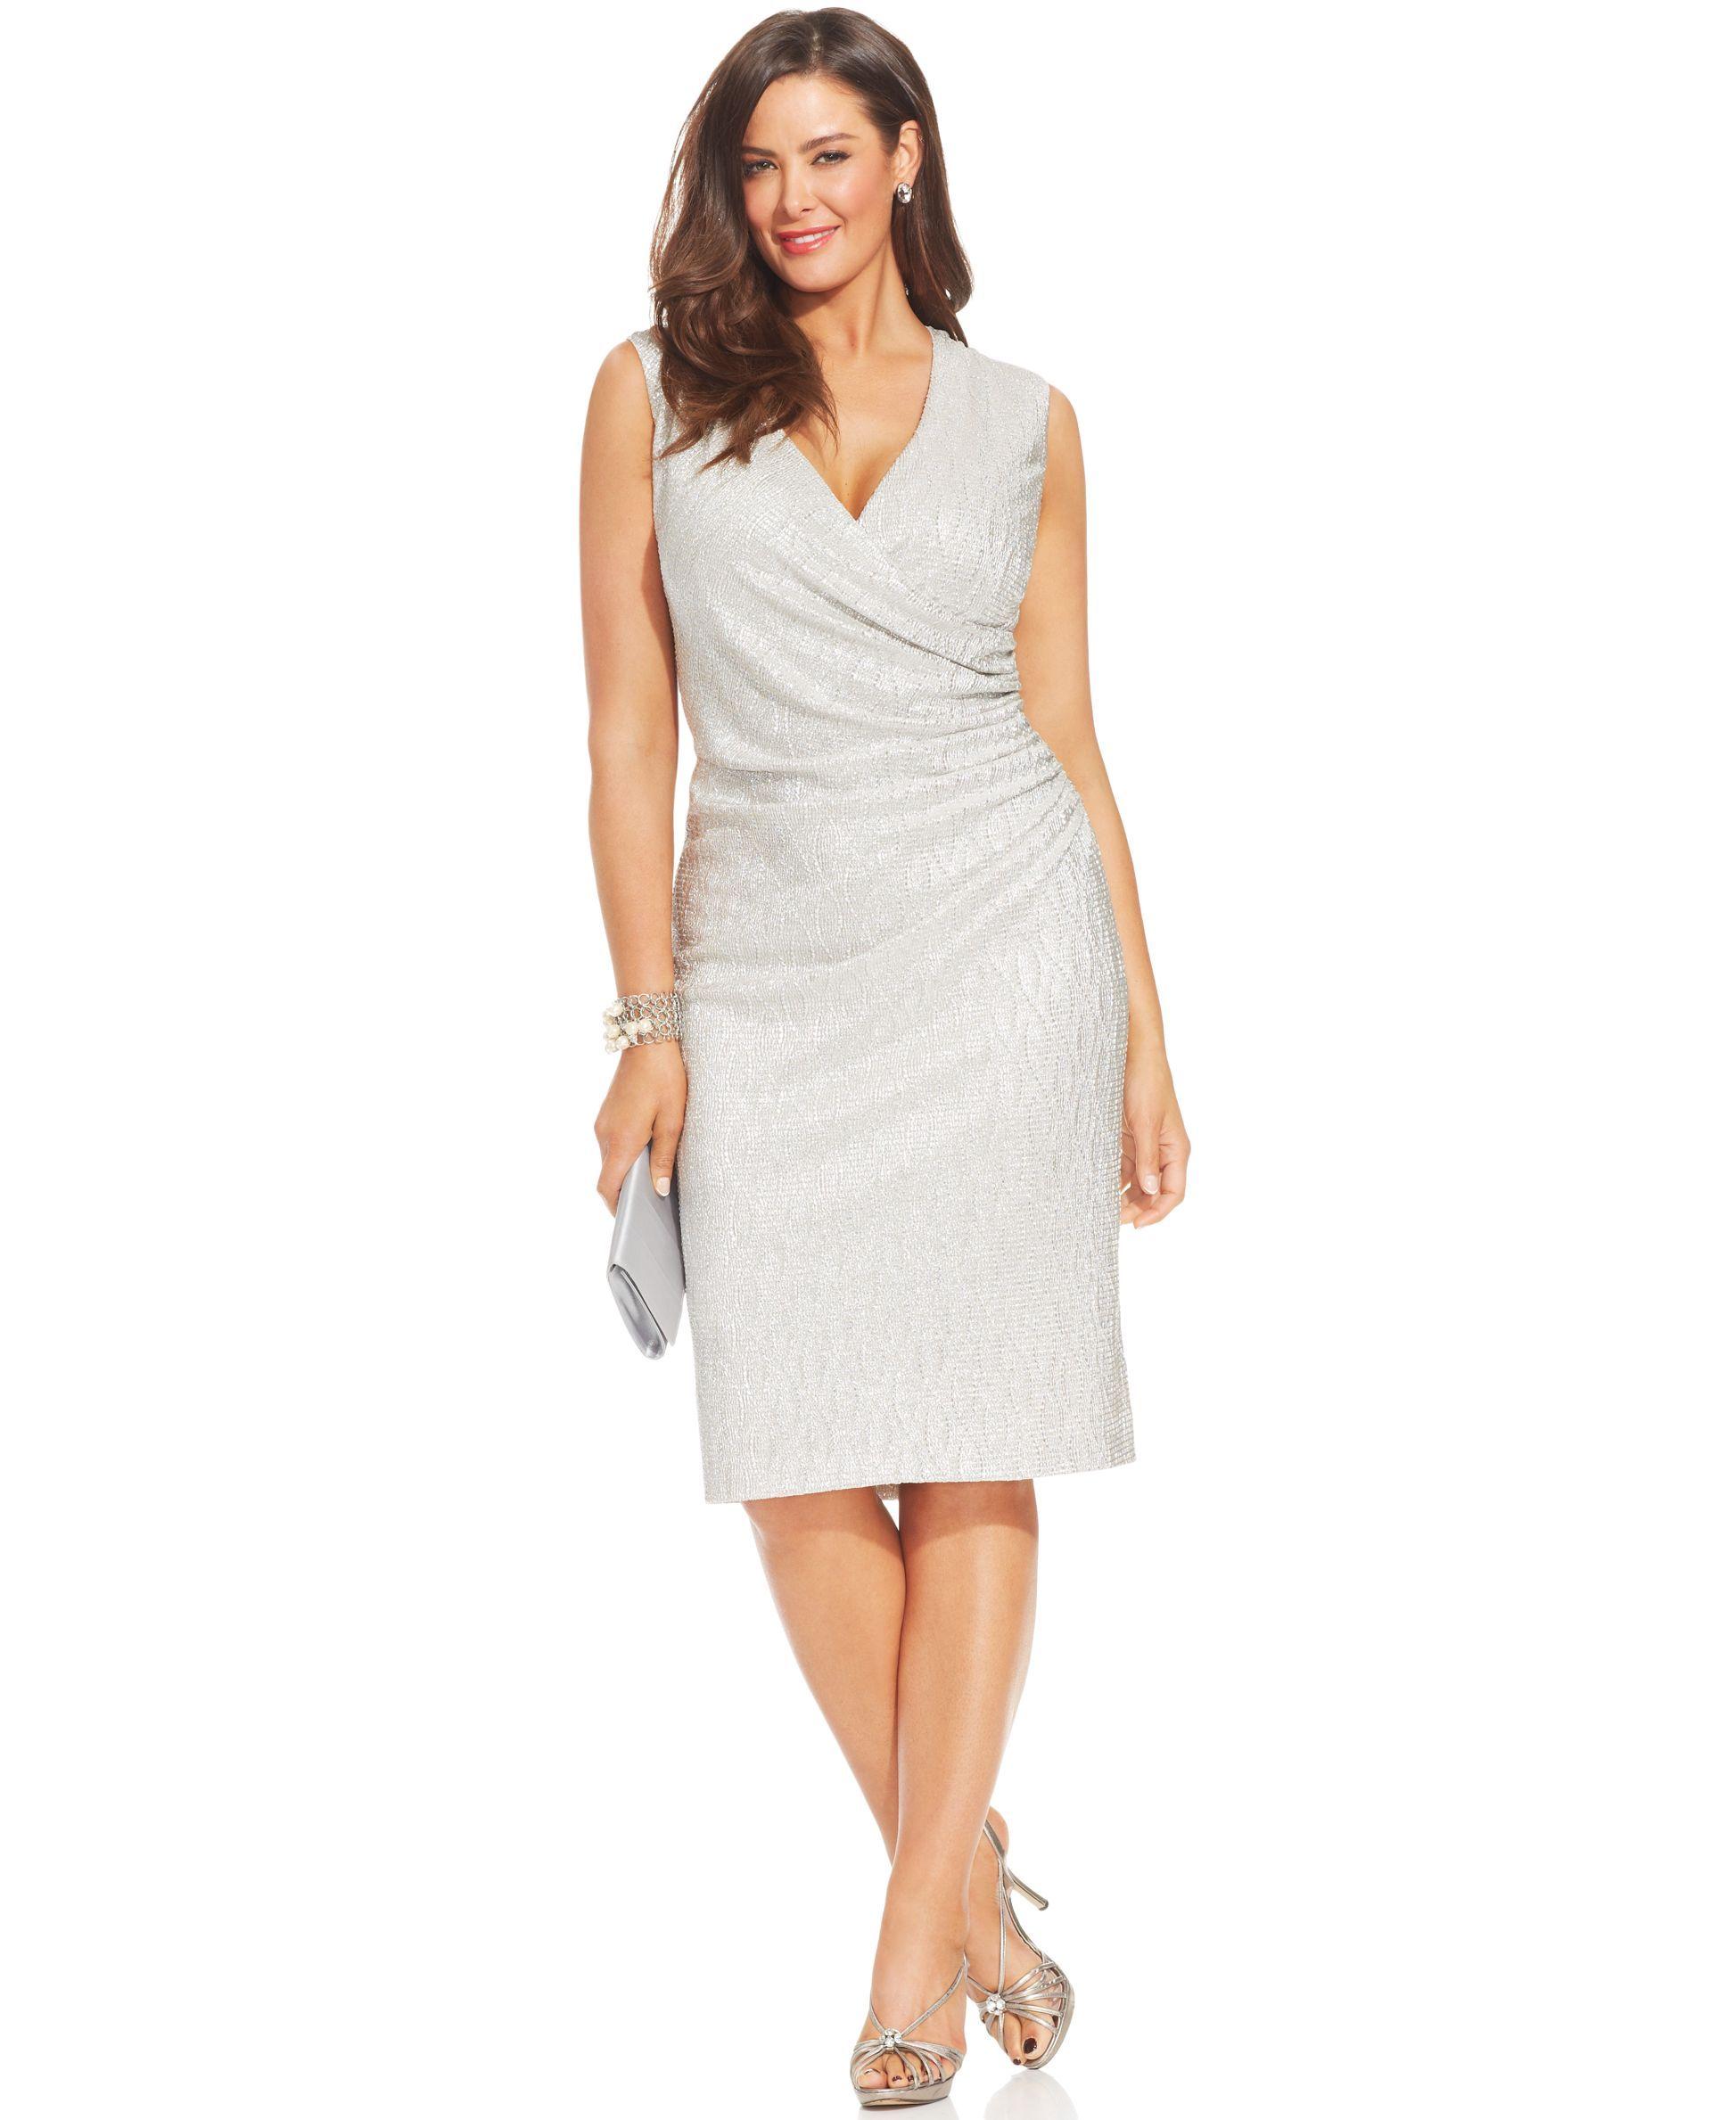 Vestidos plus size online baratos